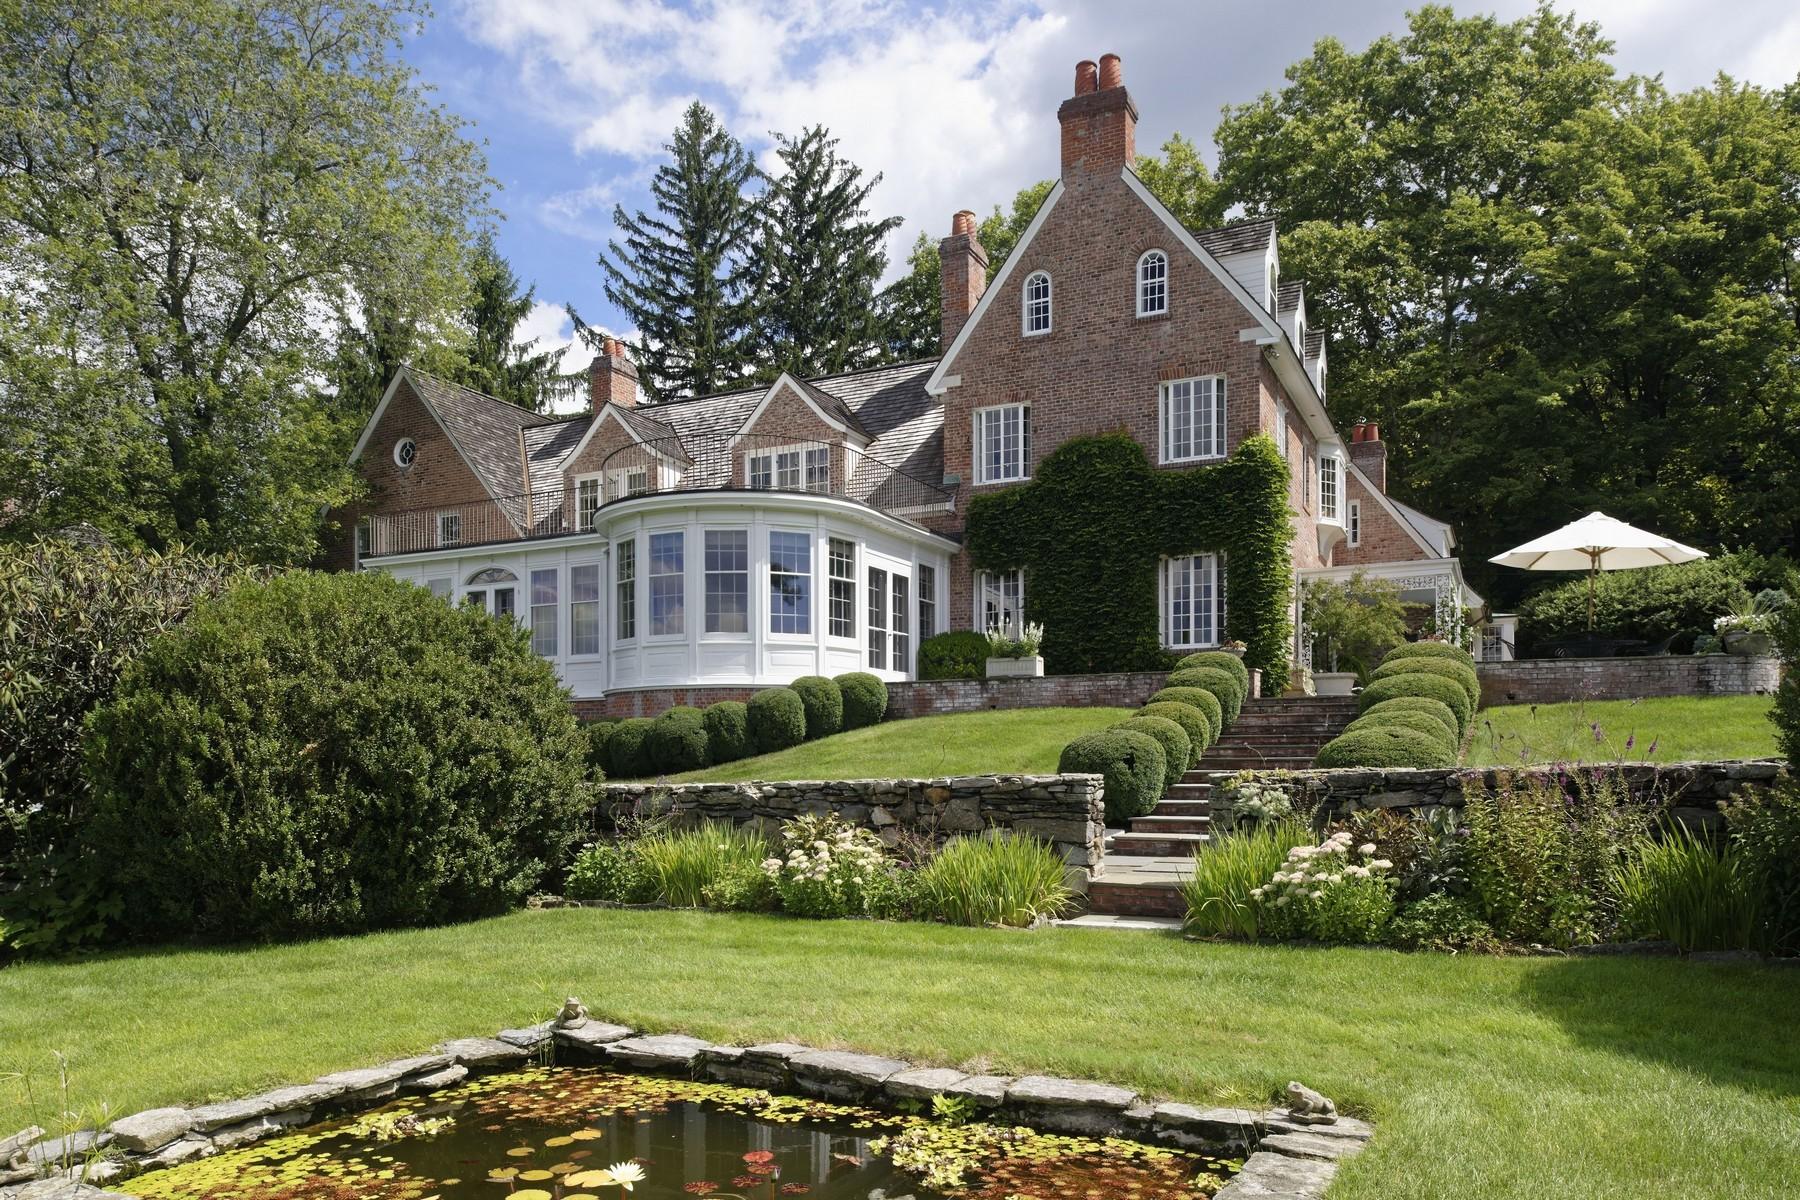 Nhà ở một gia đình vì Bán tại SASCO MANOR WITH PANORAMIC WATER VIEWS 828 Sasco Hill Road Fairfield, Connecticut 06824 Hoa Kỳ